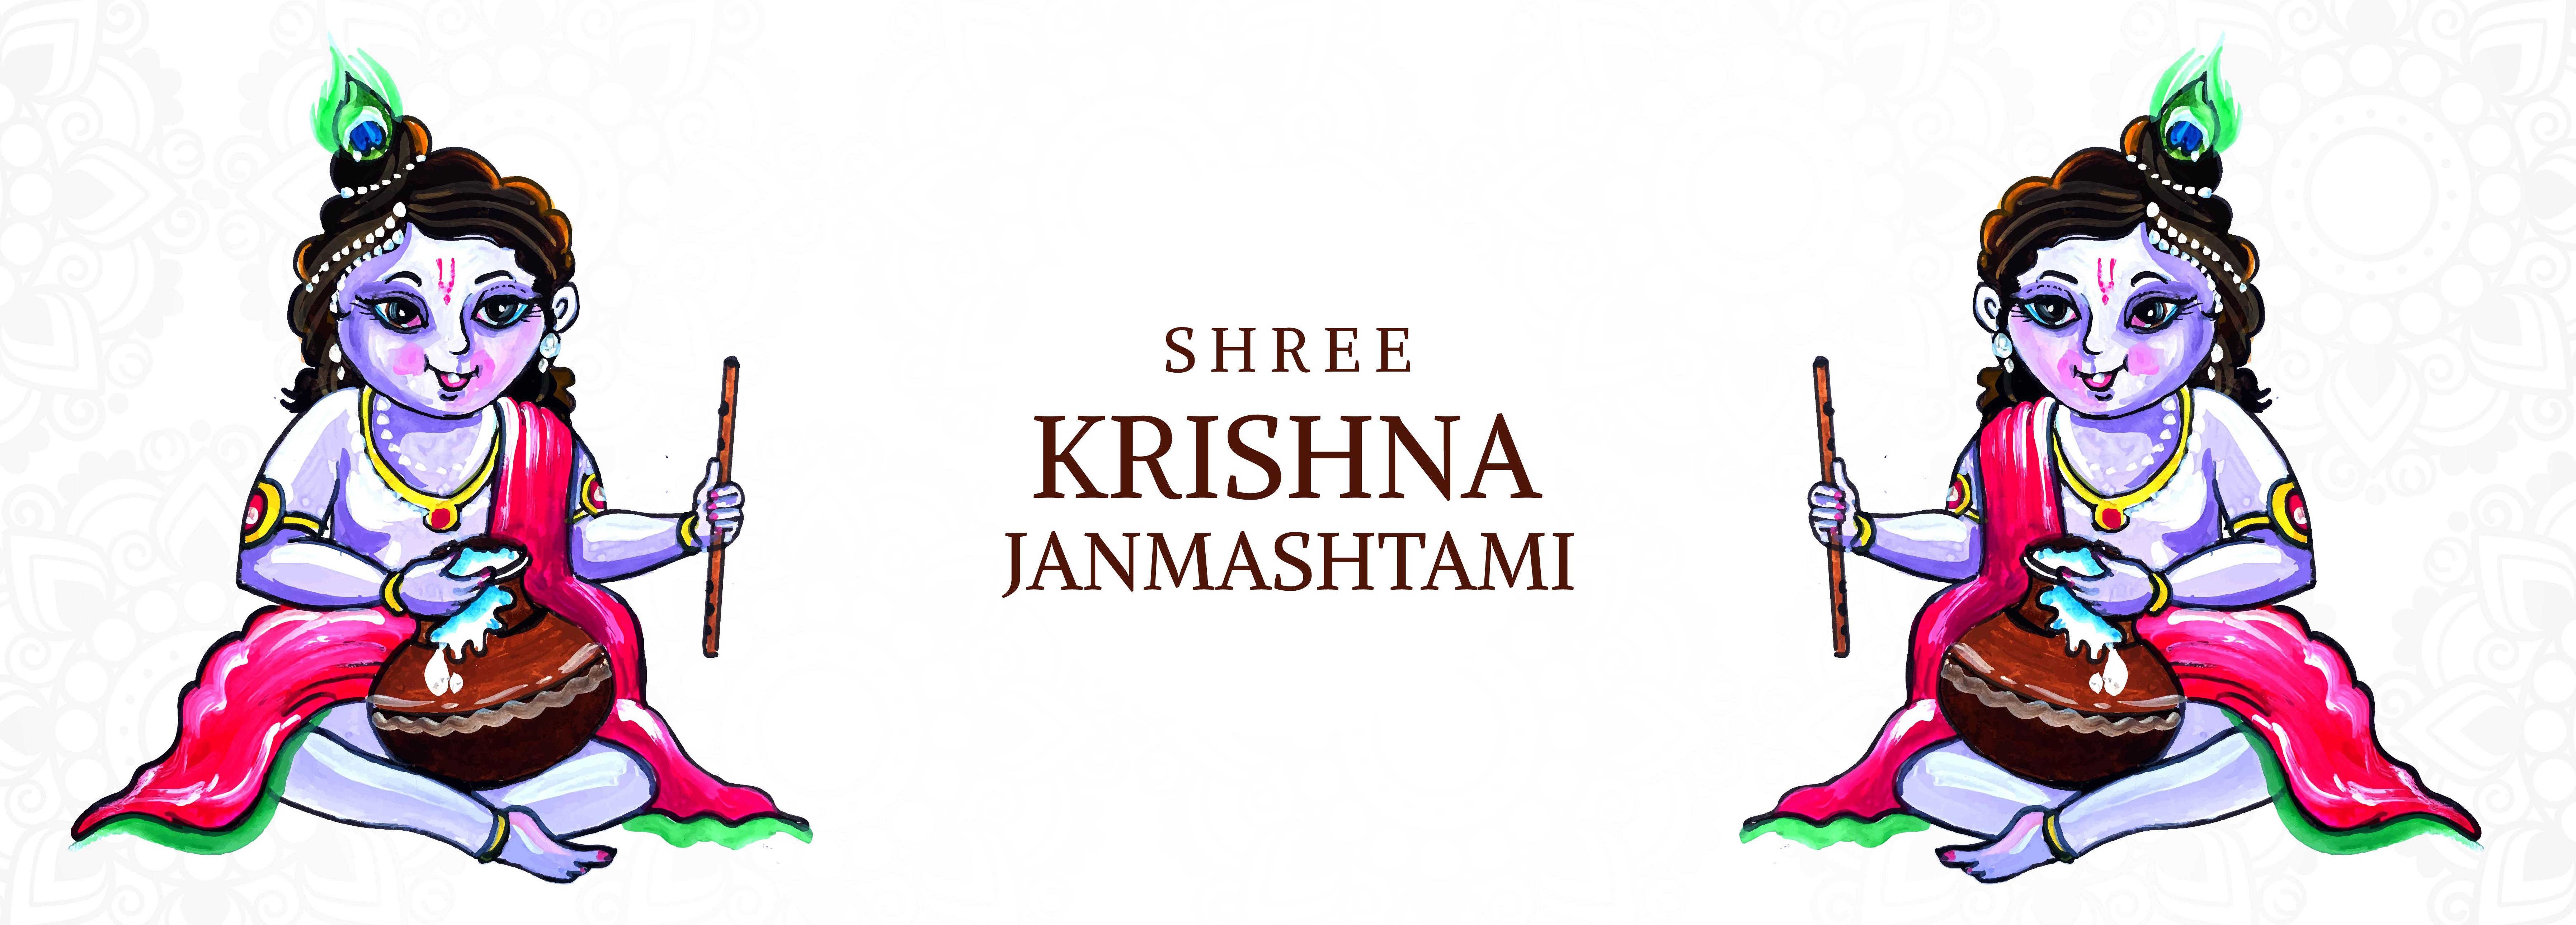 feliz krishna janmashtami señor krishna sentado con olla, flauta